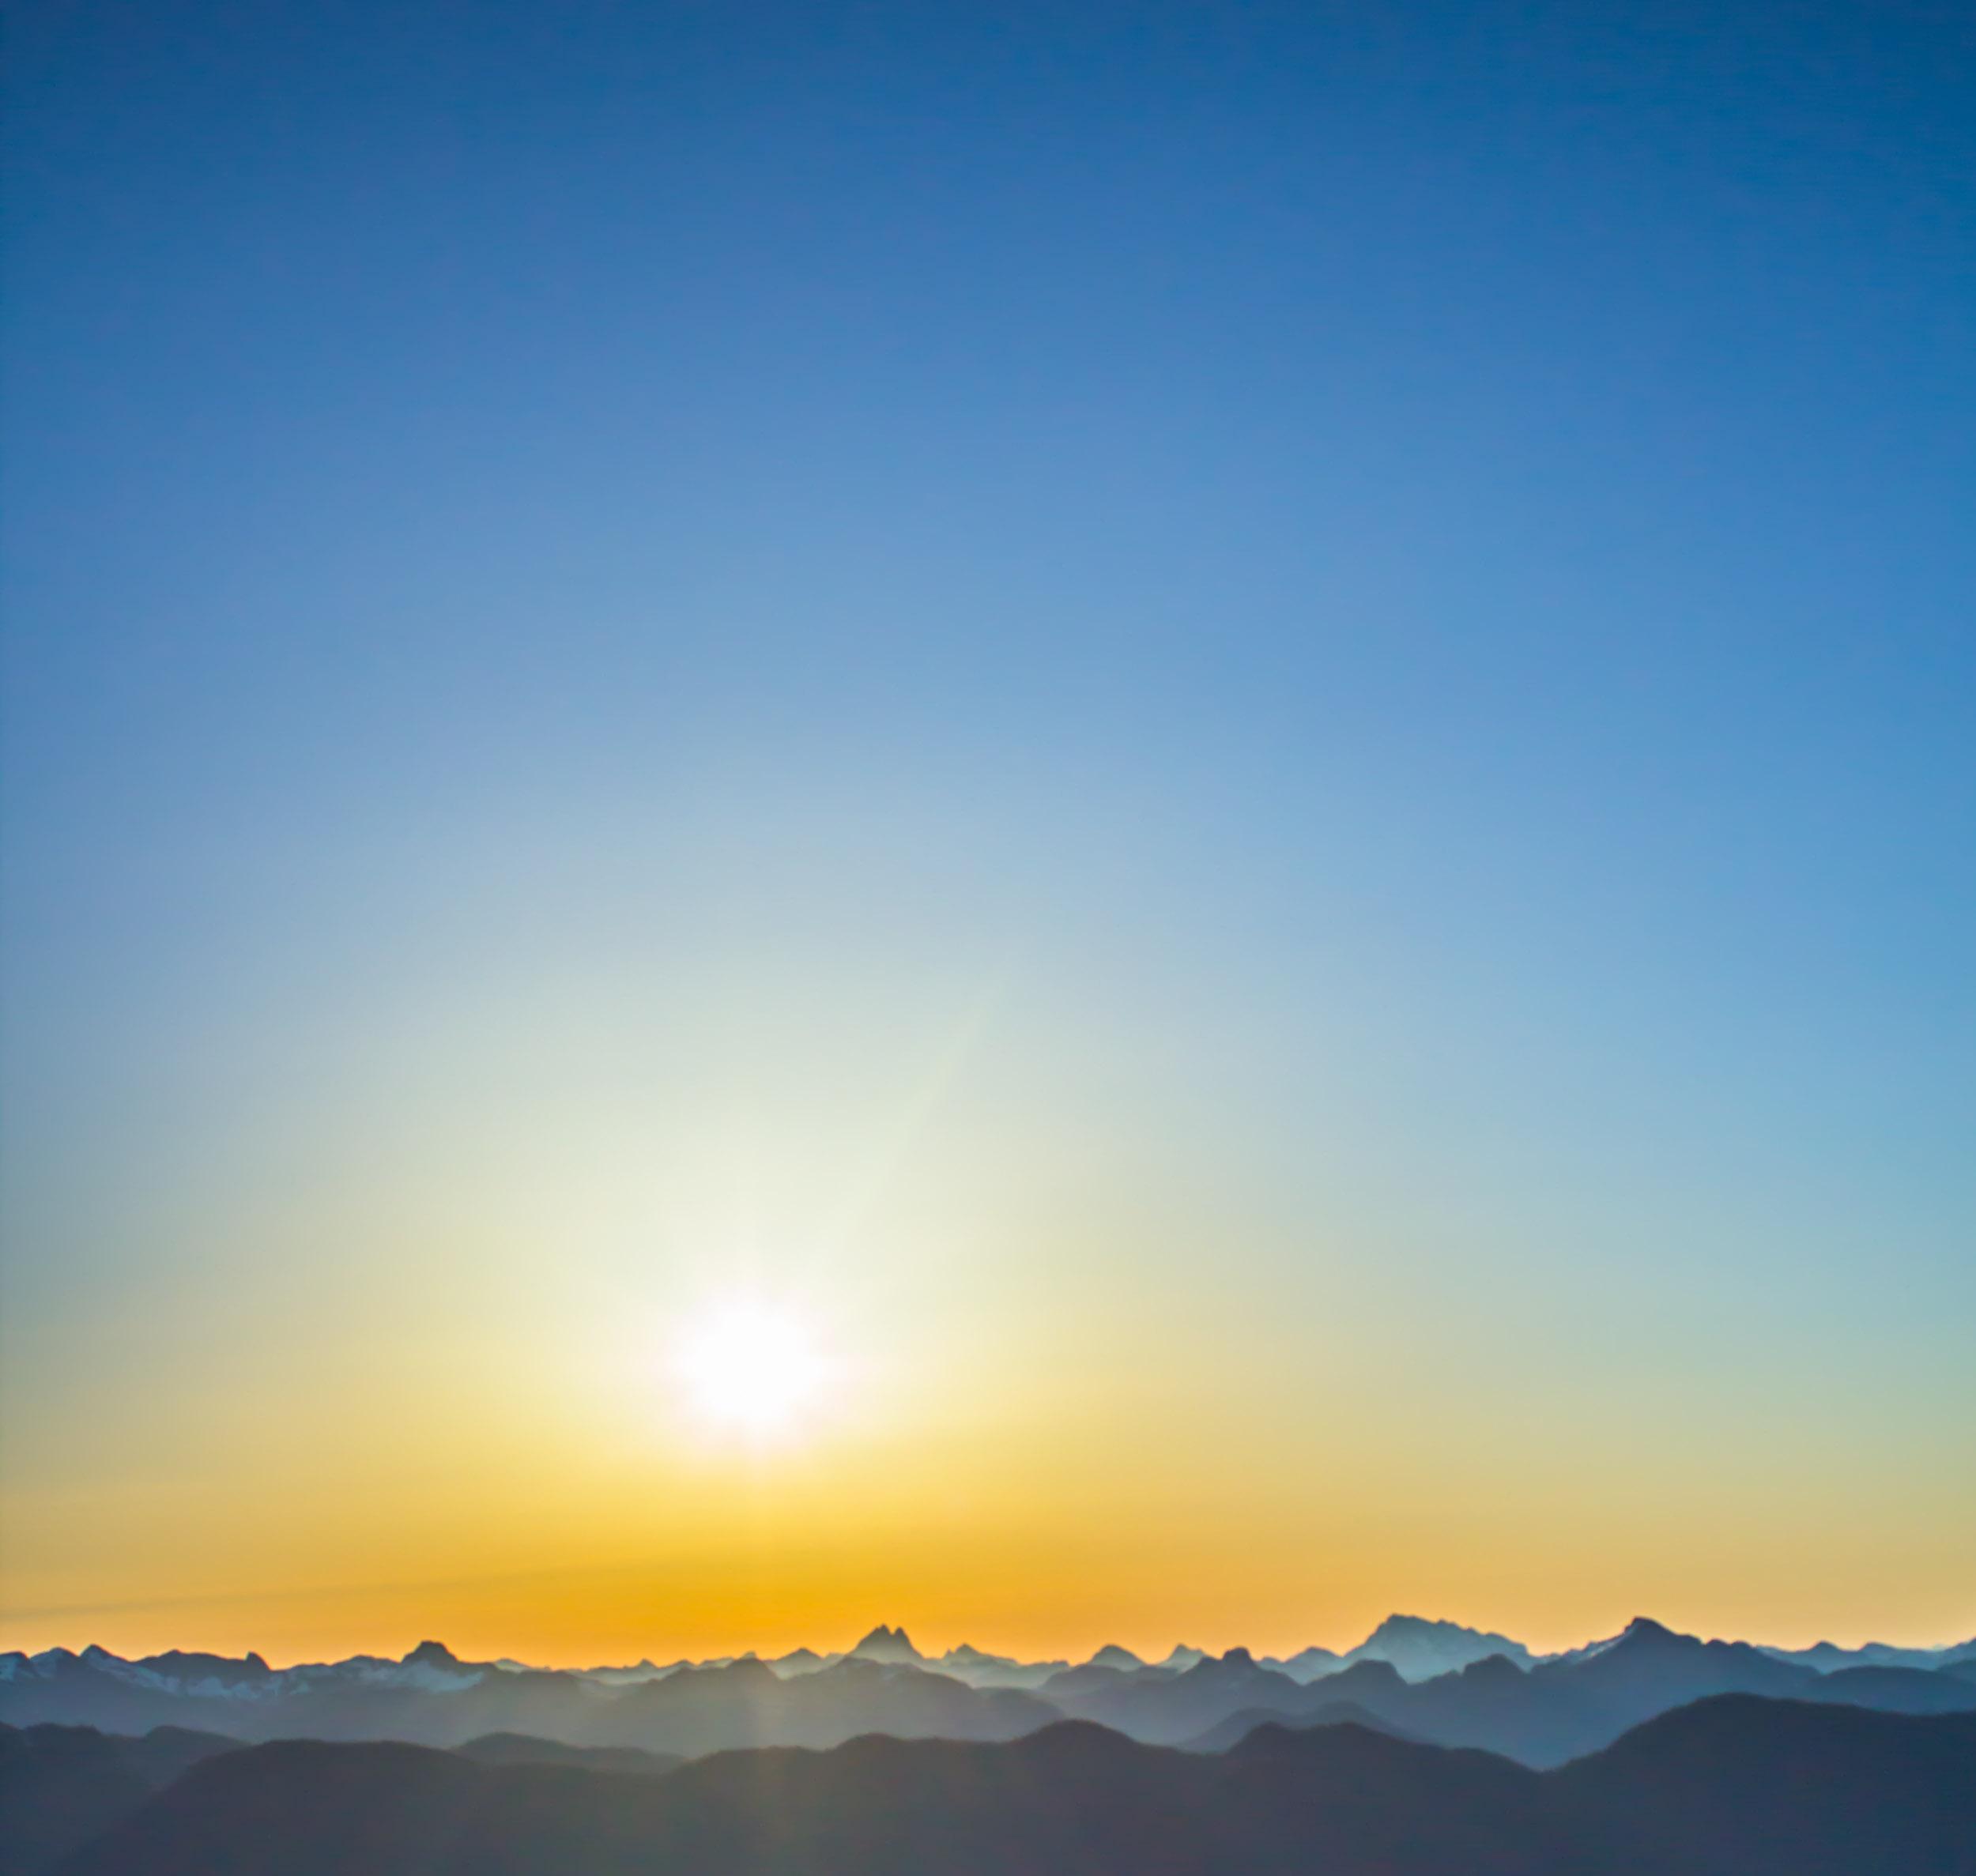 20150507 - Chasing Sunrise-46.jpg